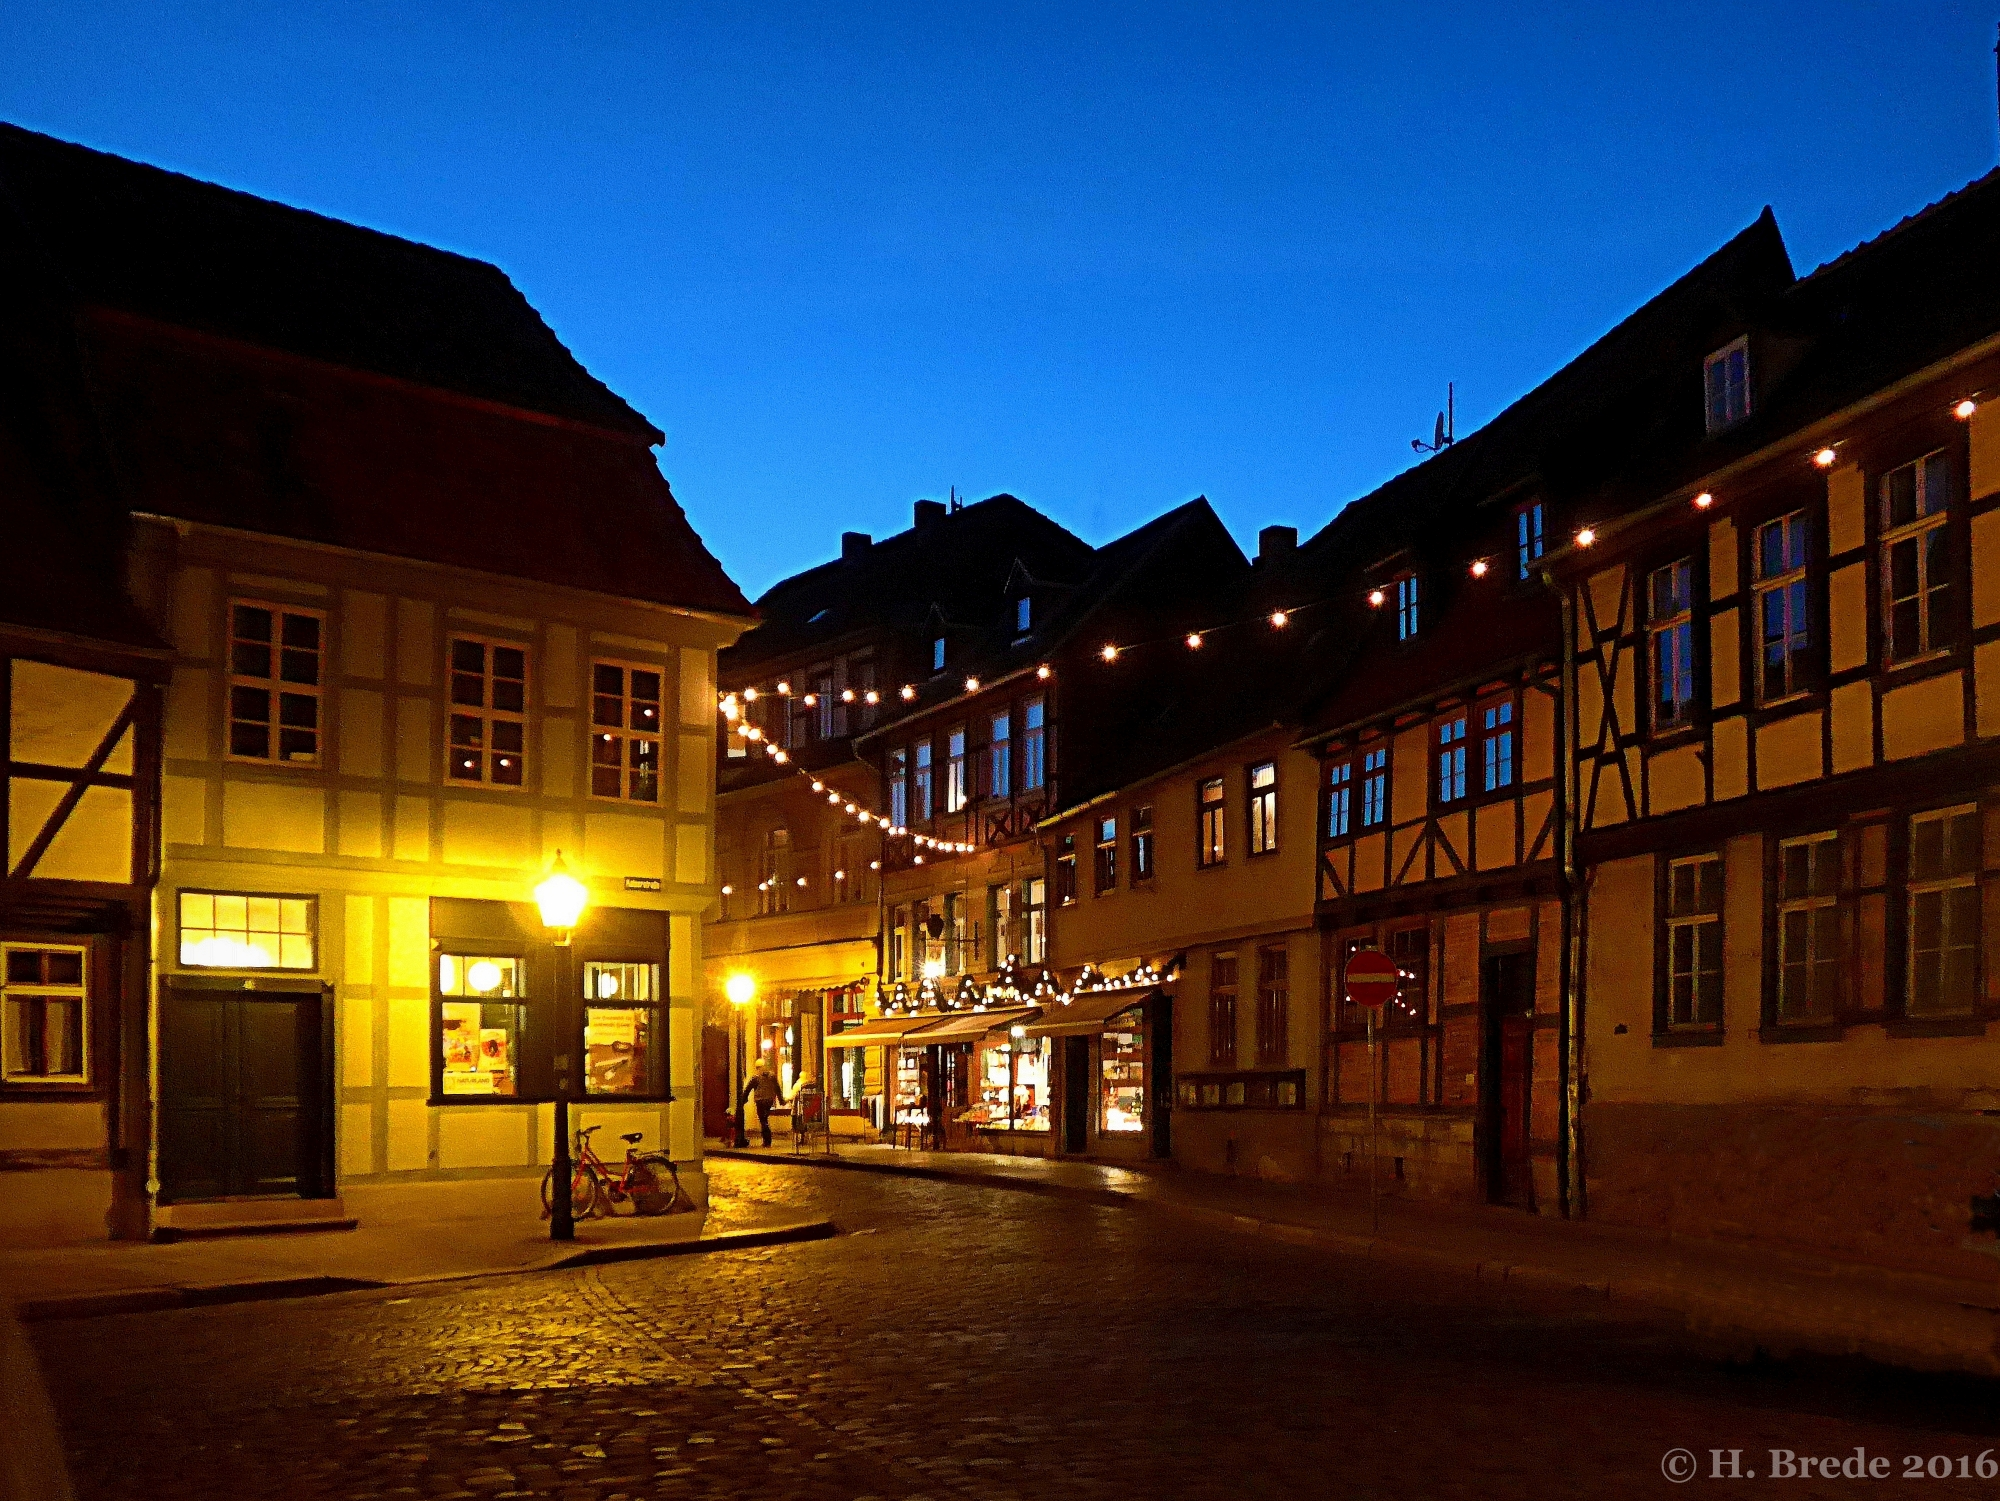 Night at Quedlingburg, Germany